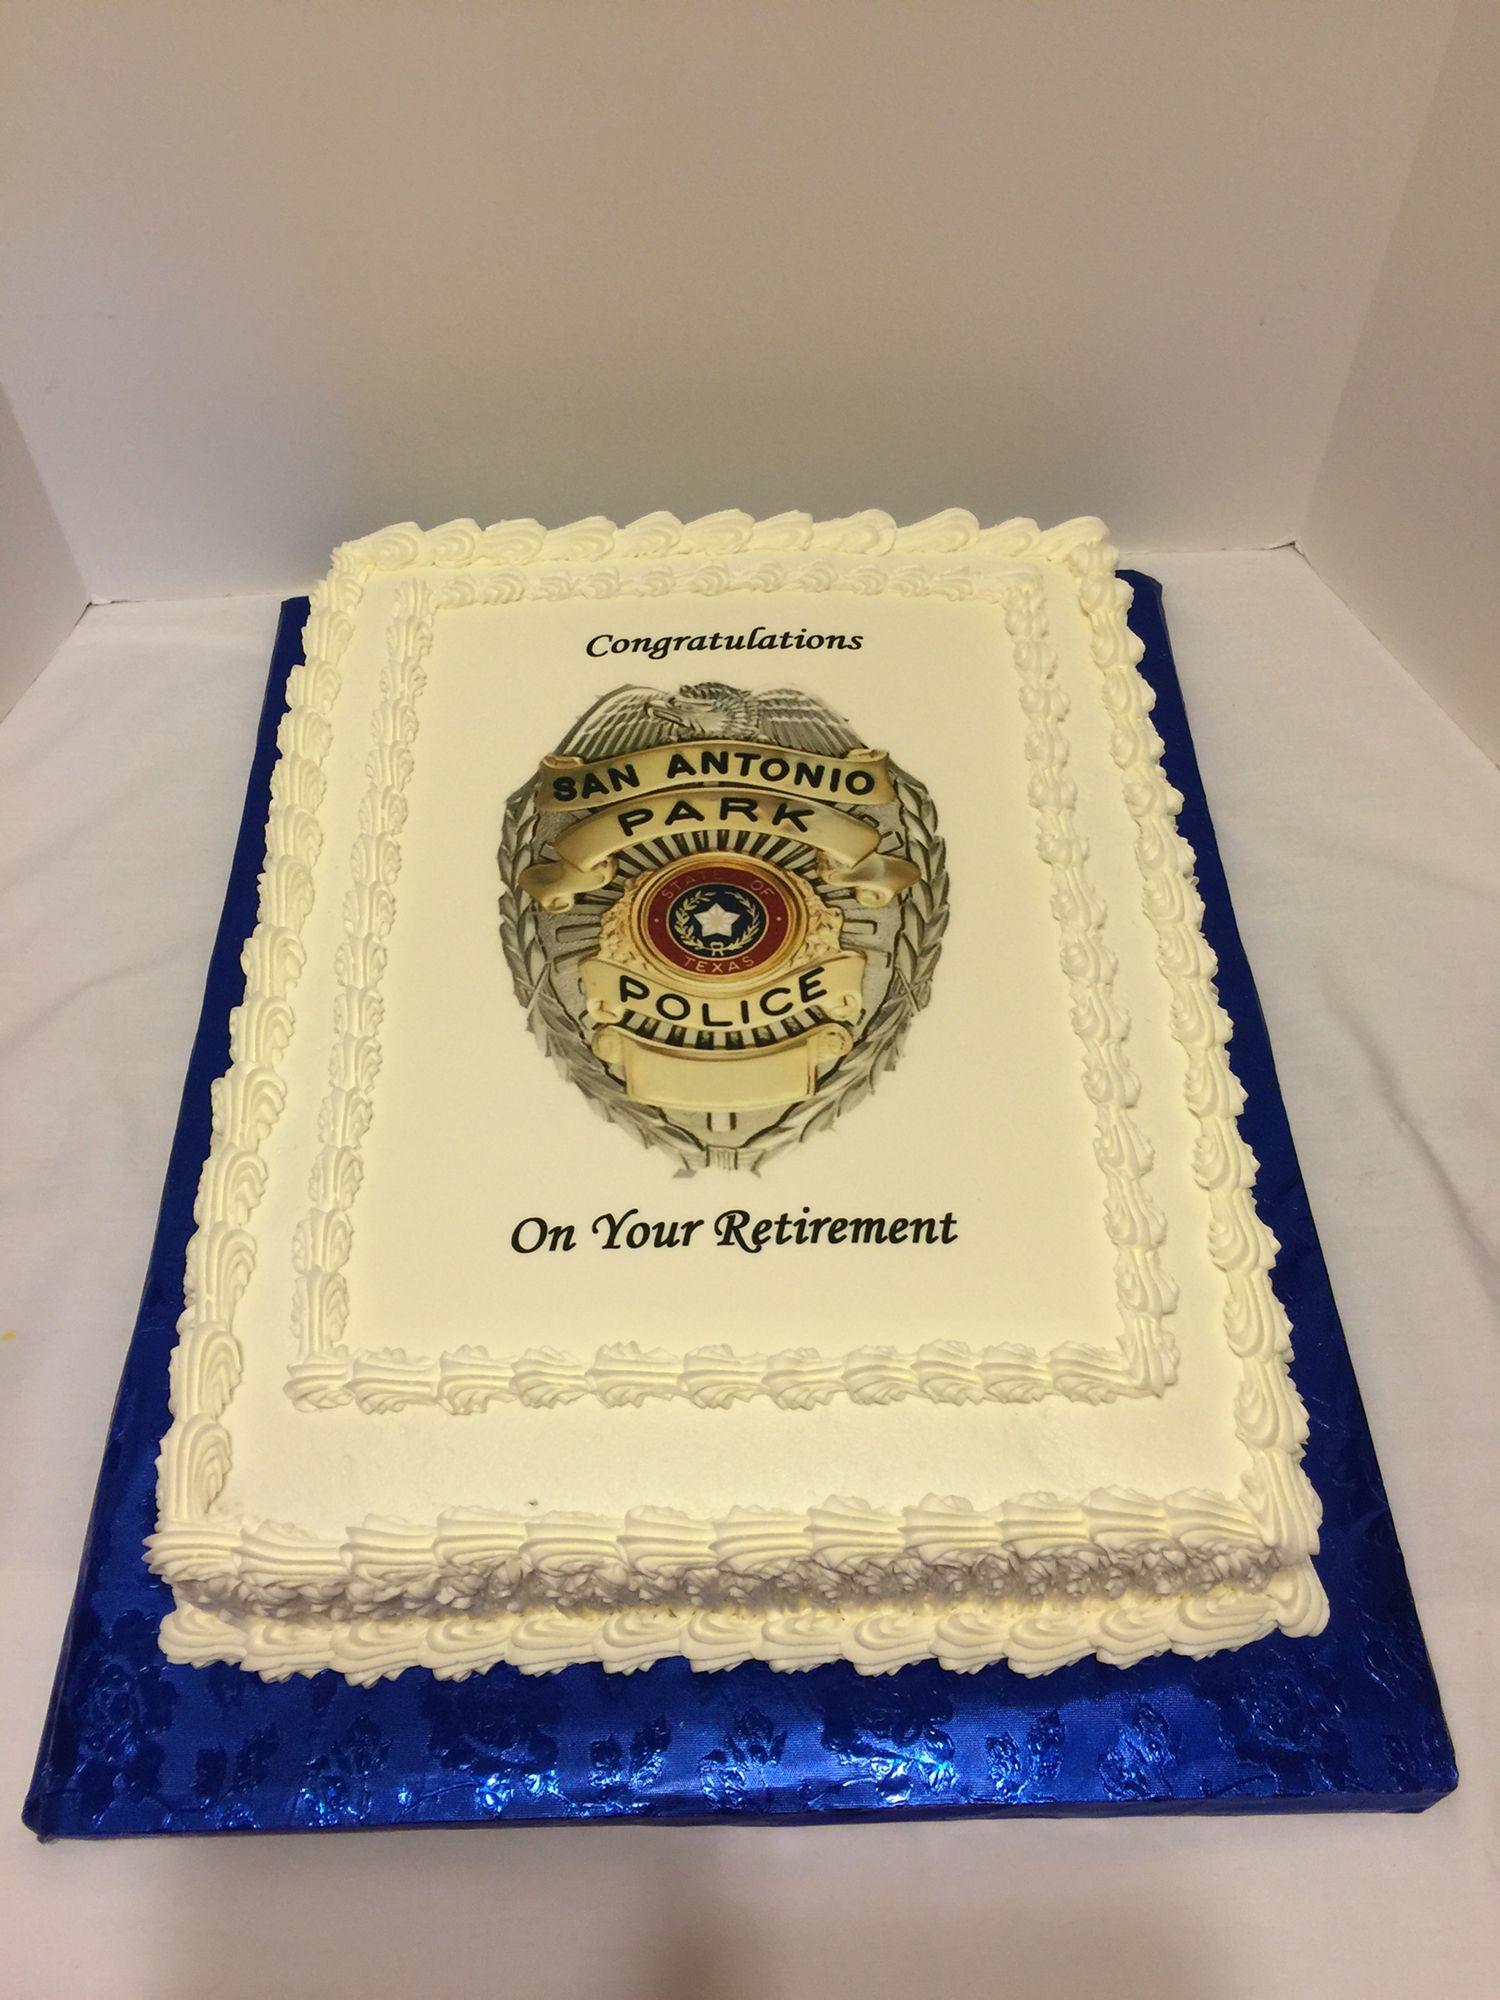 Police Retirement Cake Retirement Cakes Police Retirement